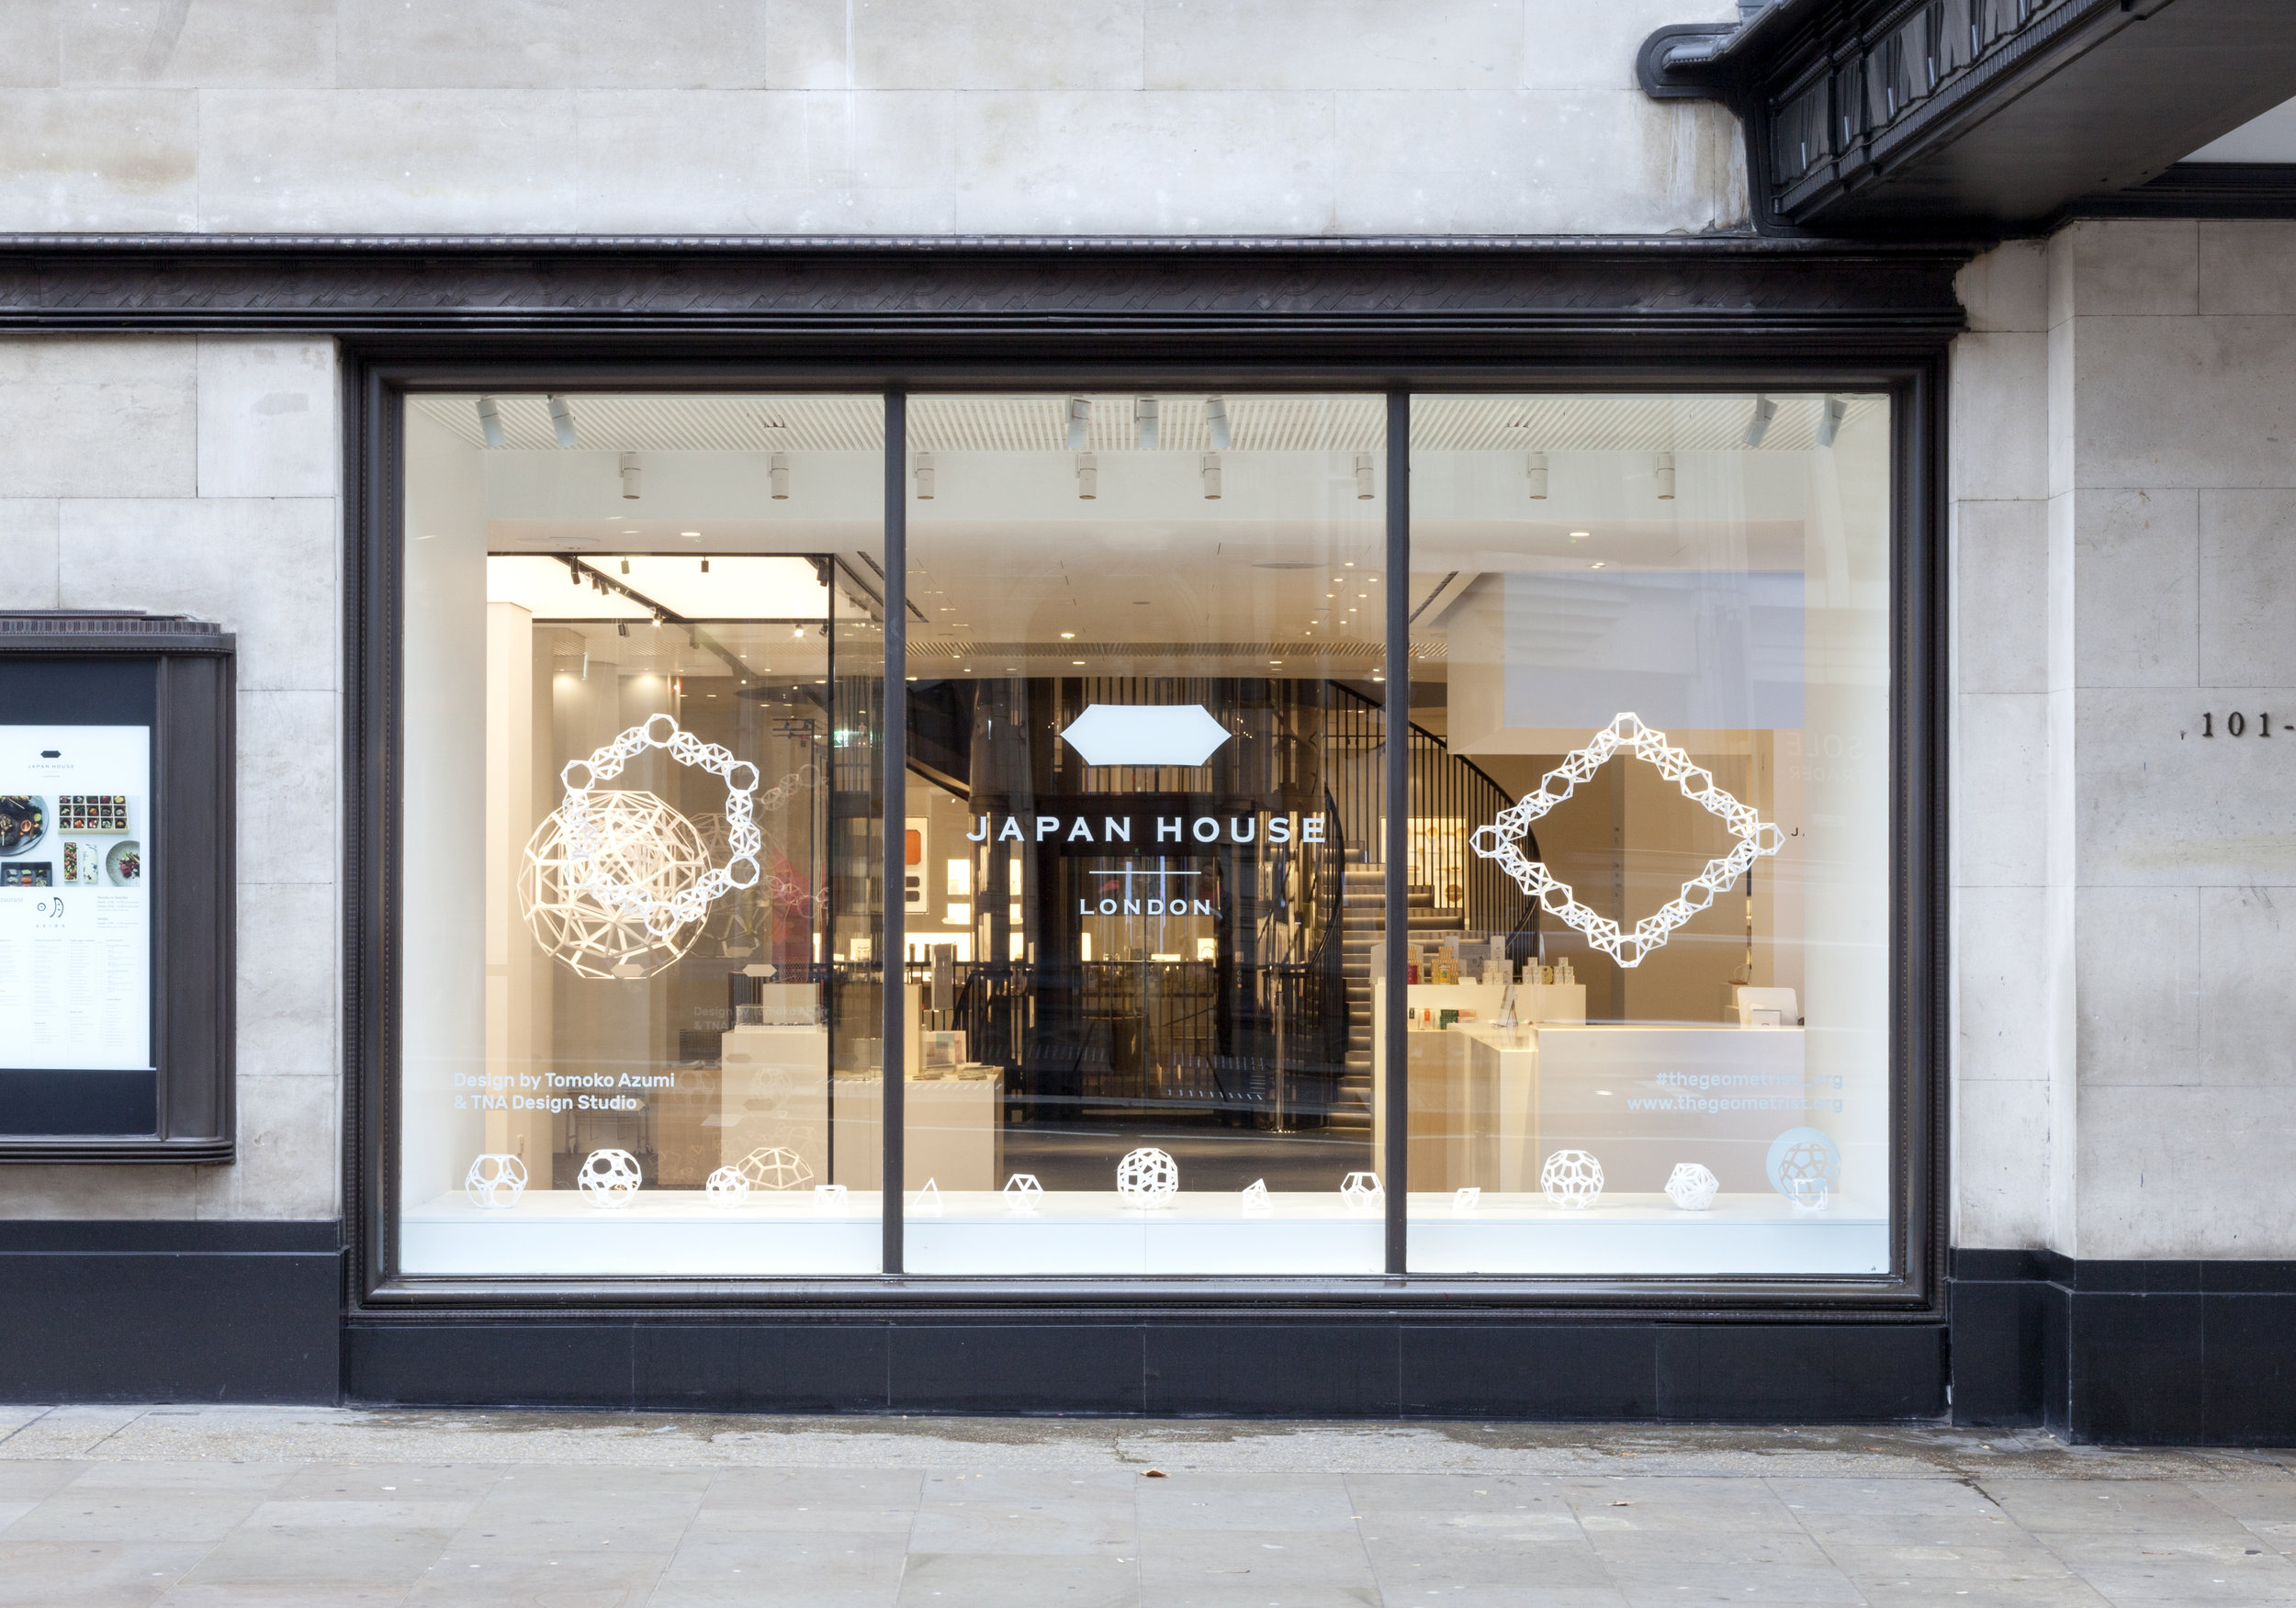 Japan House London | The Shop: until 10 January 2019